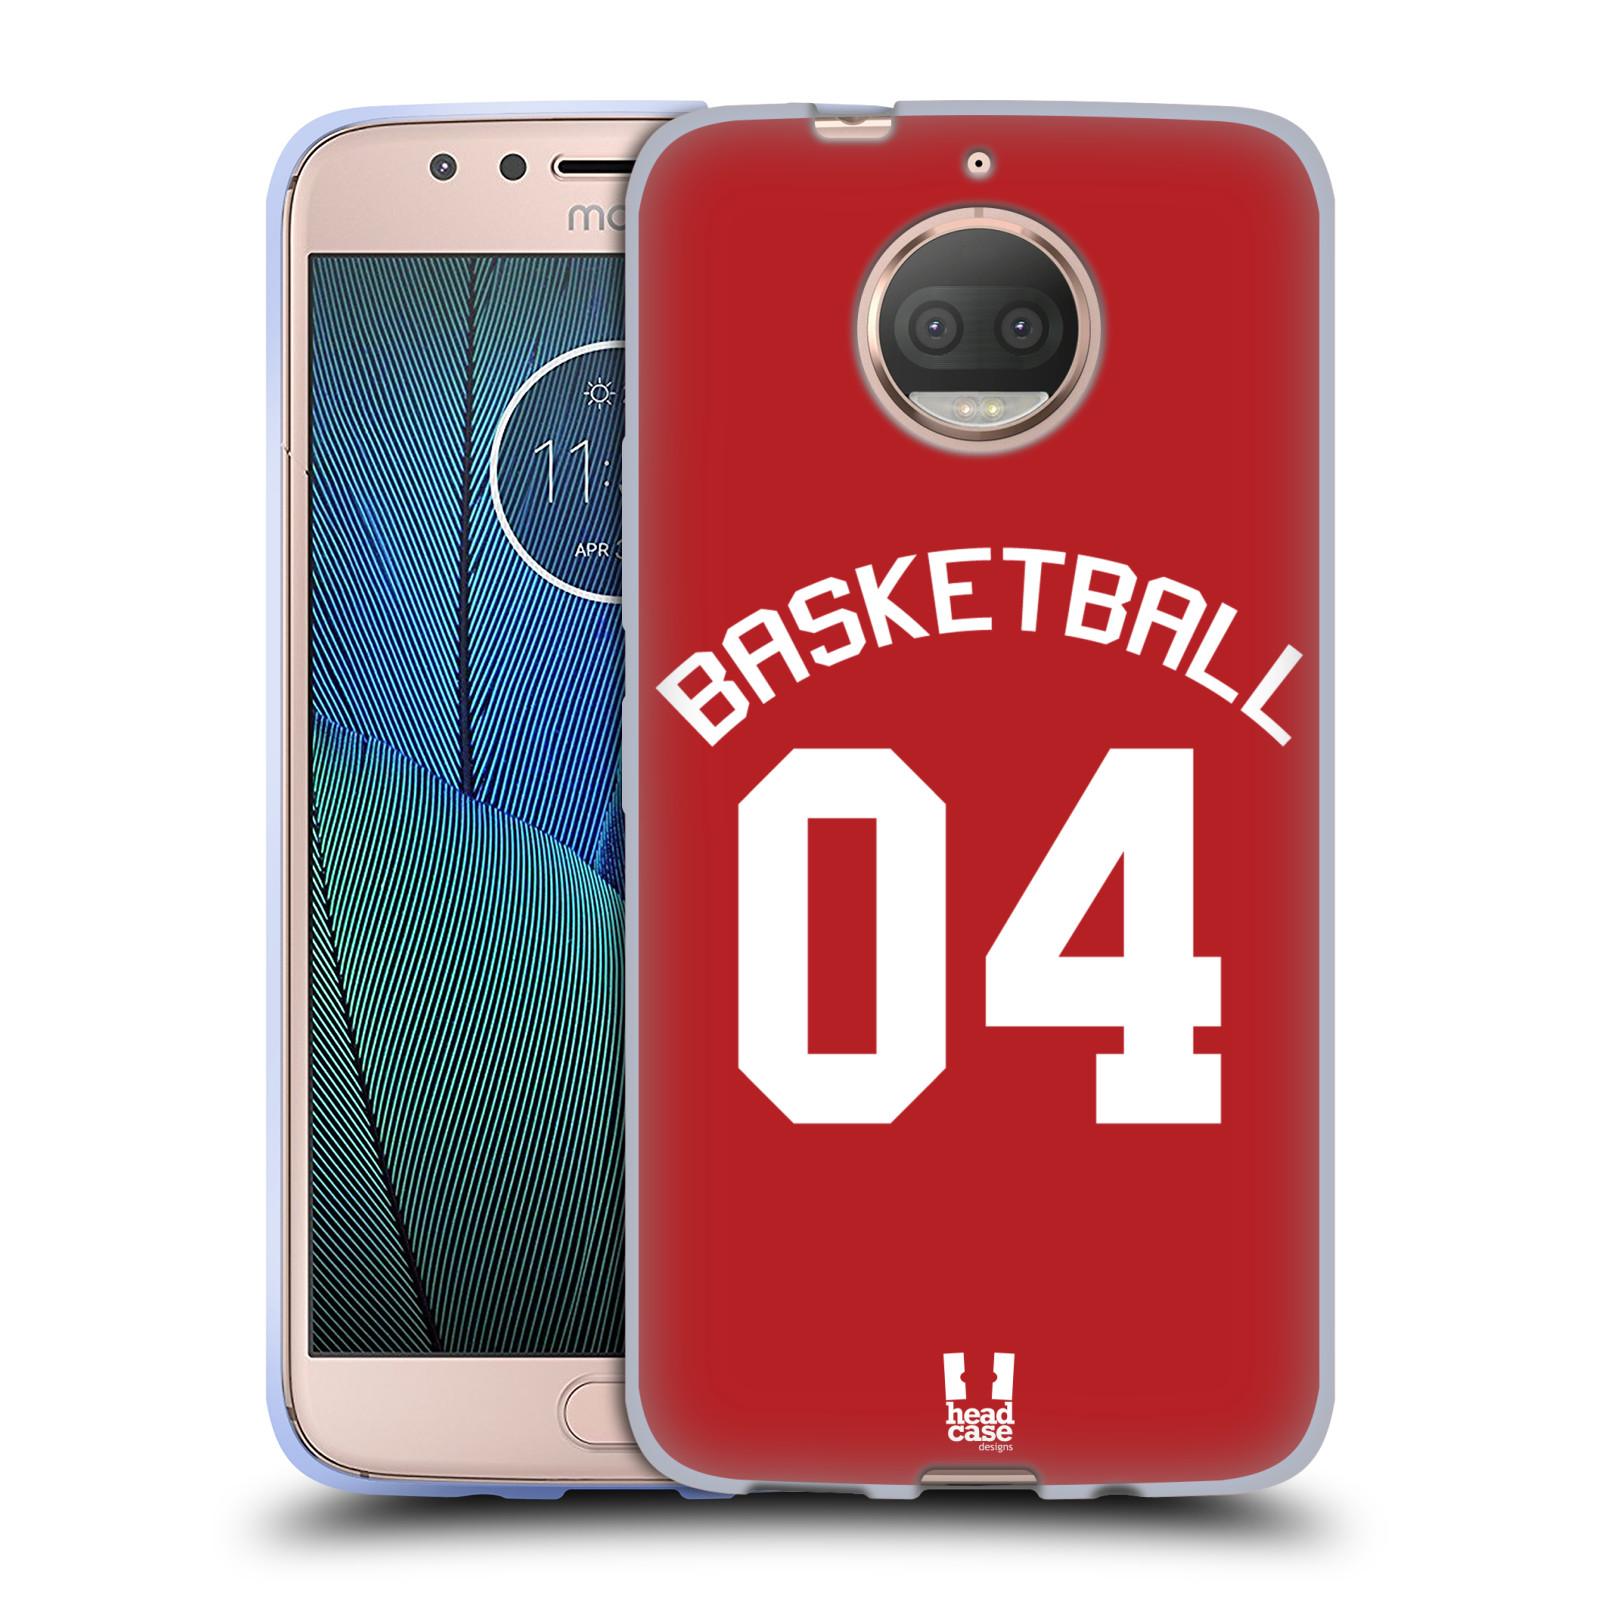 HEAD CASE silikonový obal na mobil Lenovo Moto G5s PLUS Sportovní dres Basketbal červený